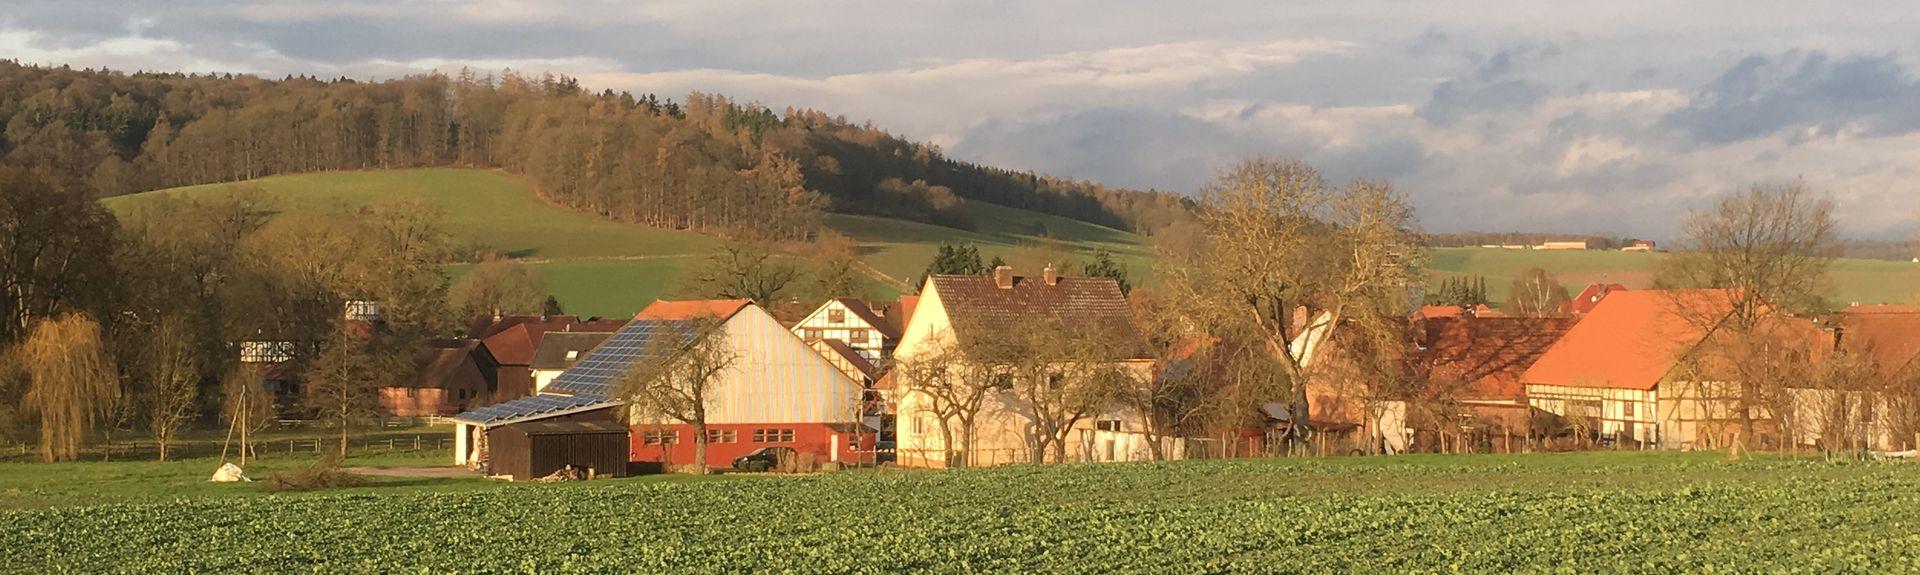 Huenfeld, Hessen, Germany